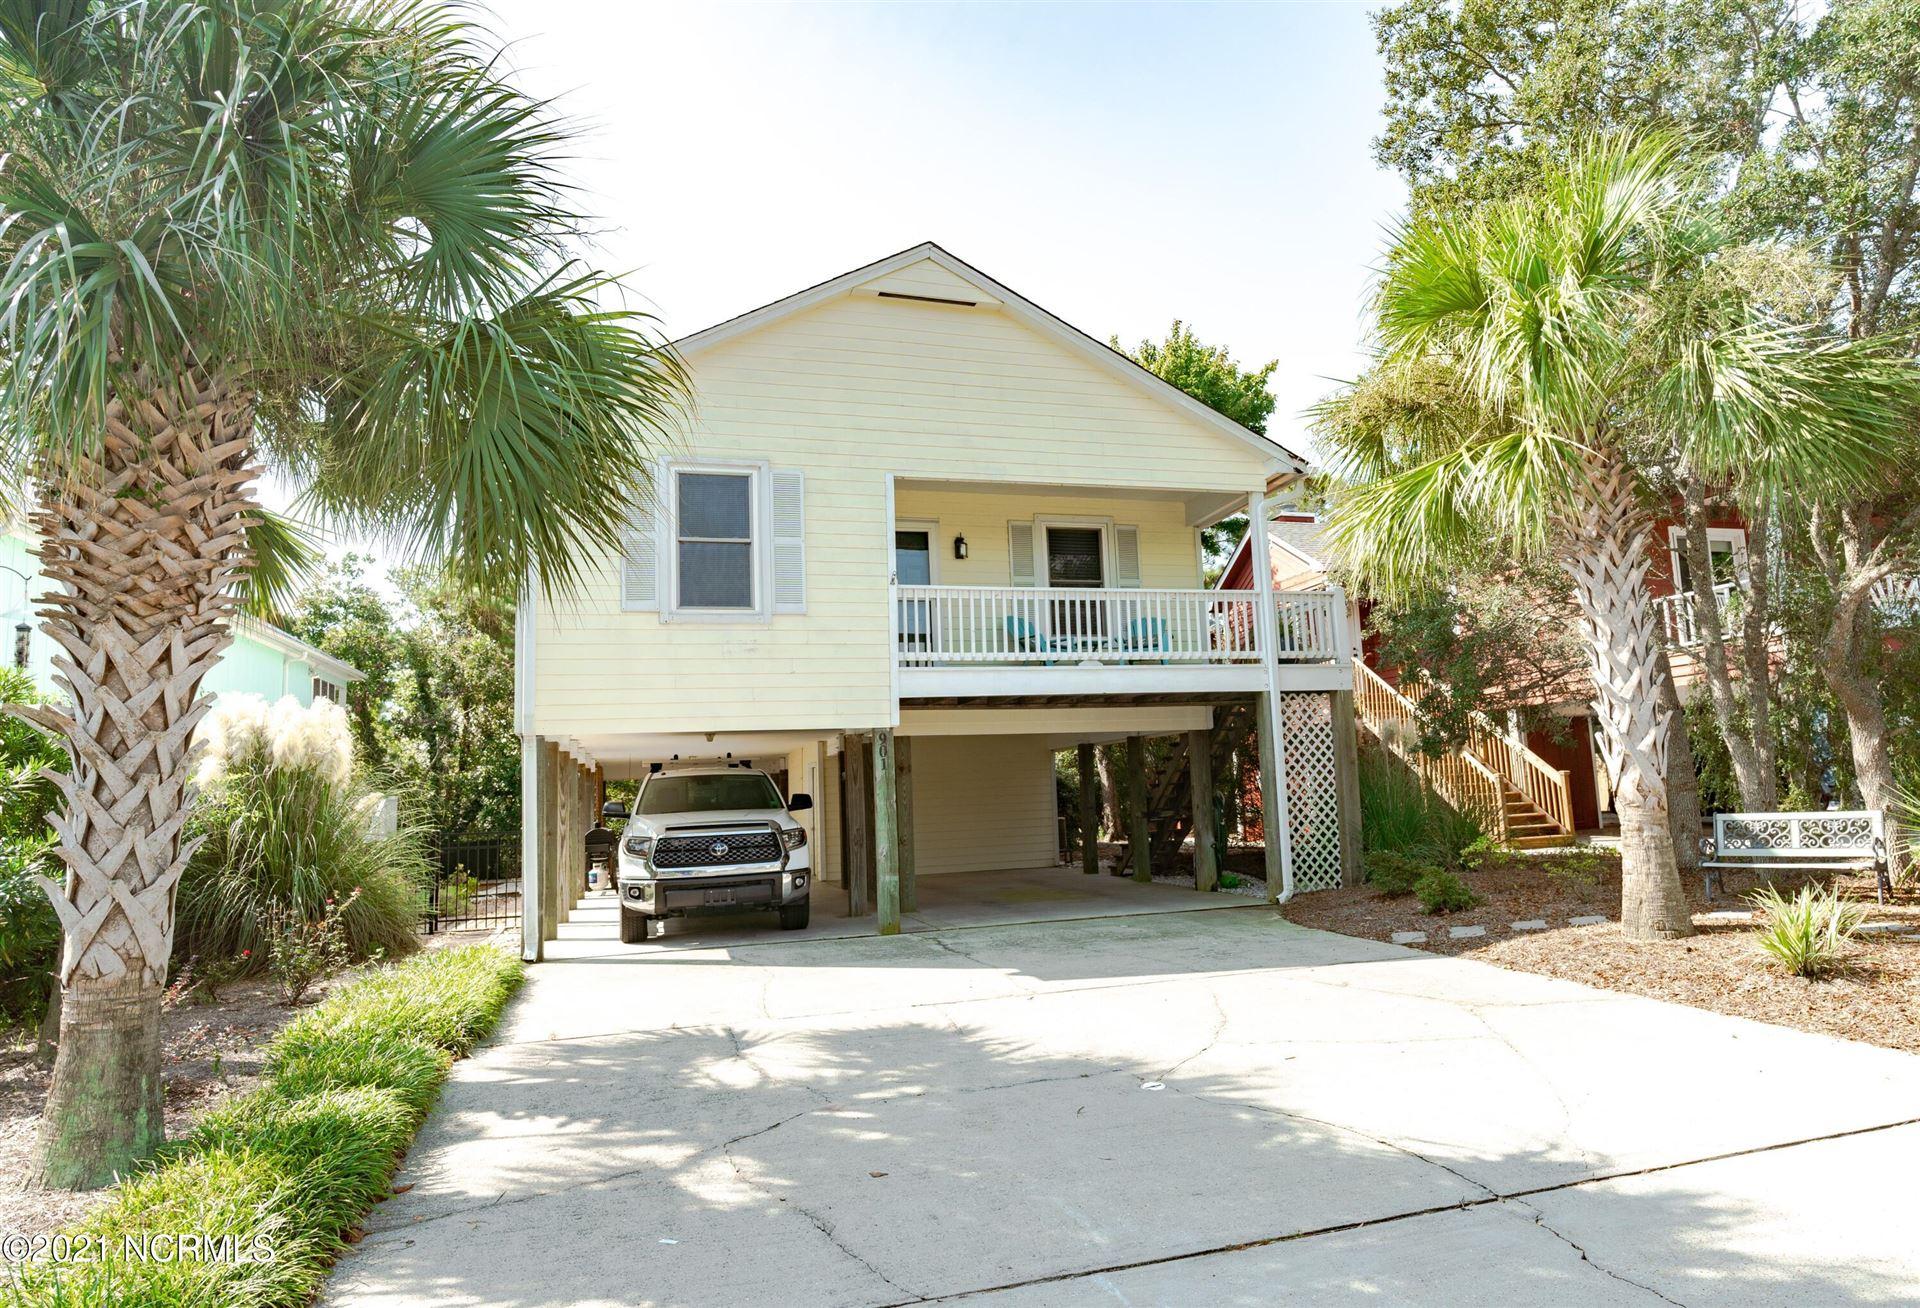 Photo of 901 Carolina Sands Drive, Carolina Beach, NC 28428 (MLS # 100290902)